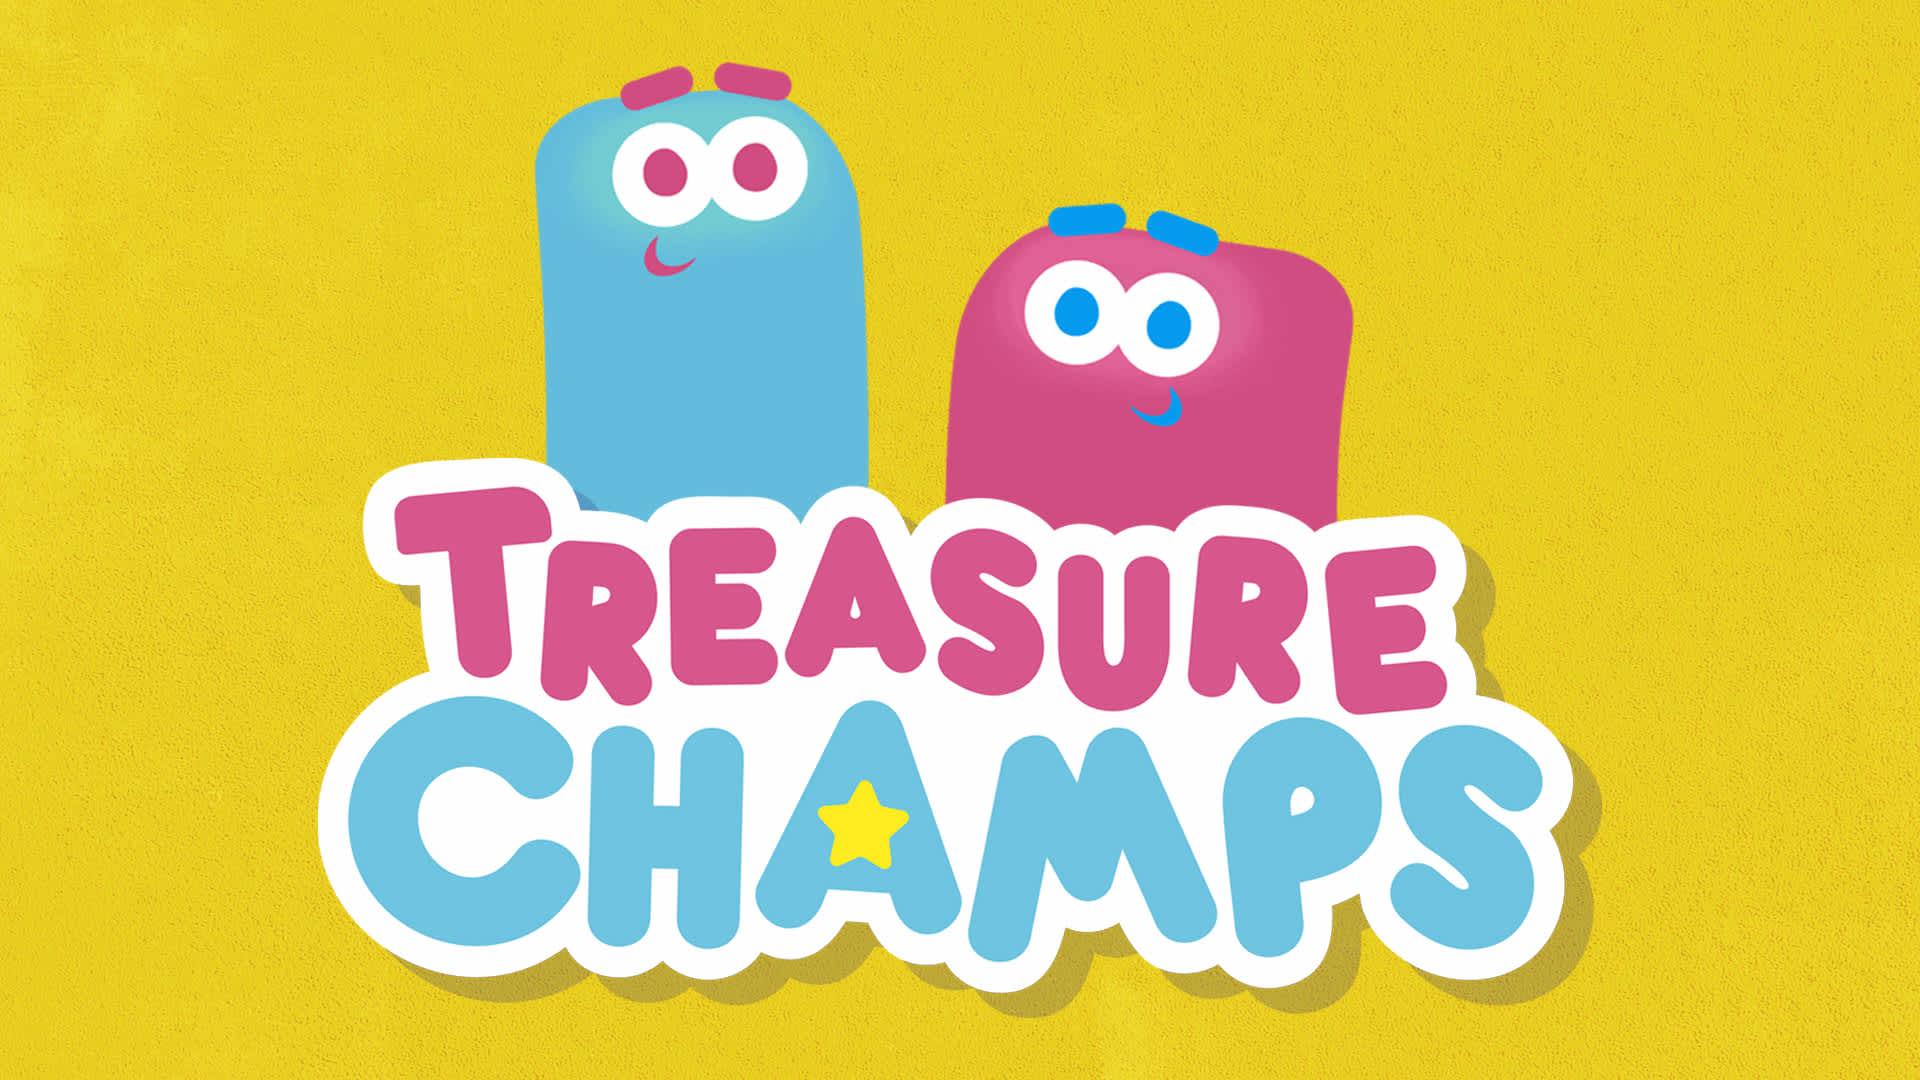 TreasureChamps-Series-Image.jpg